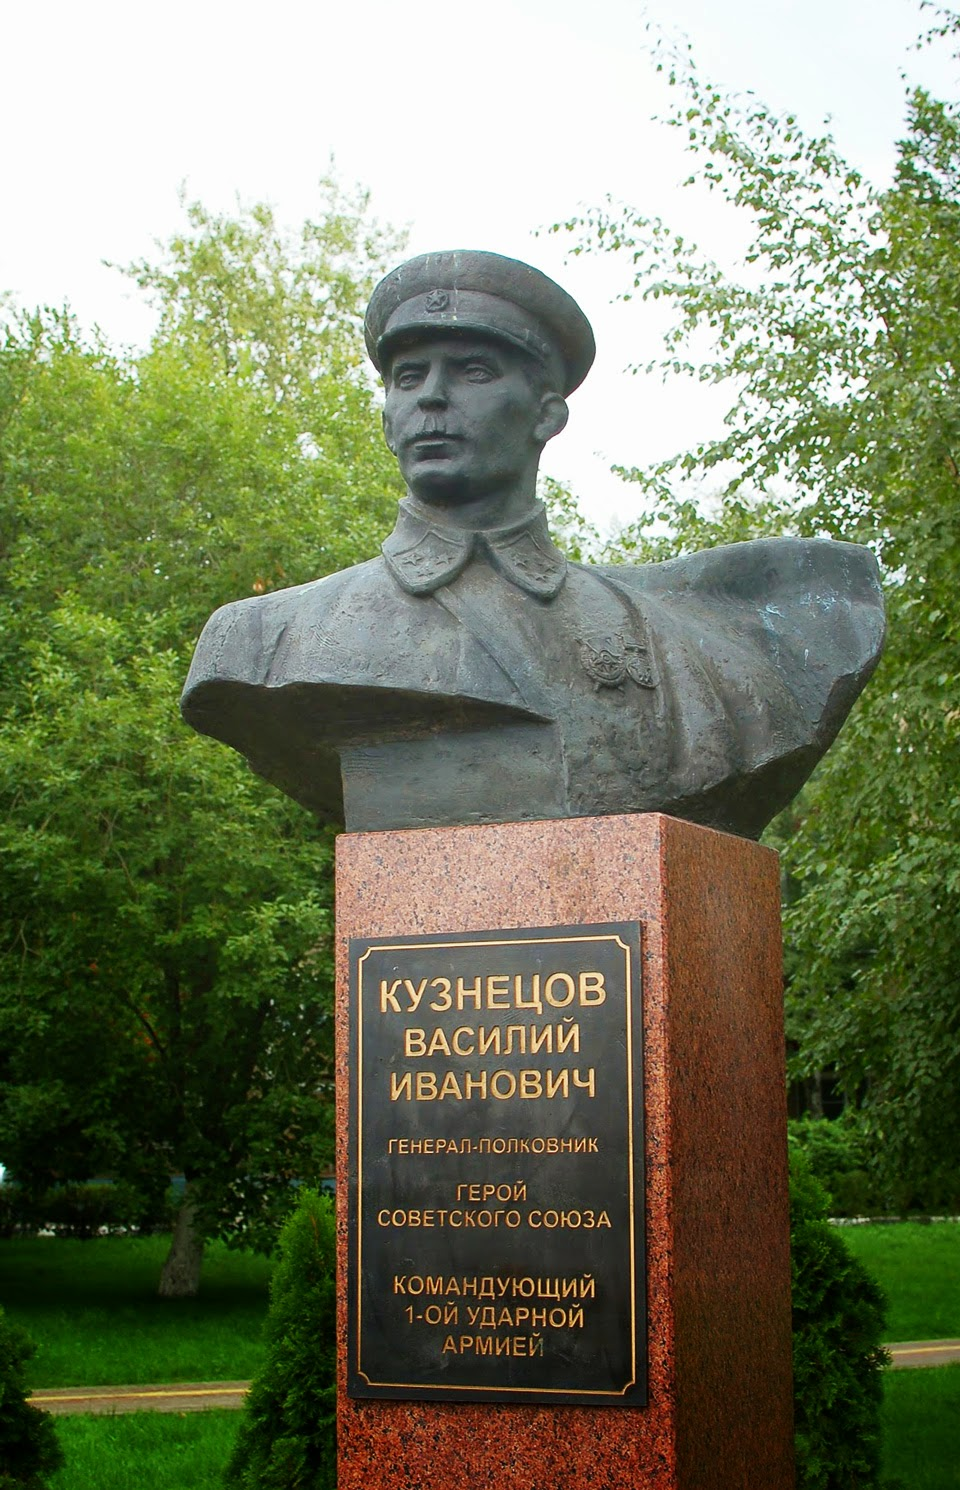 Бульвар Кузнецова, Сергиев Посад.